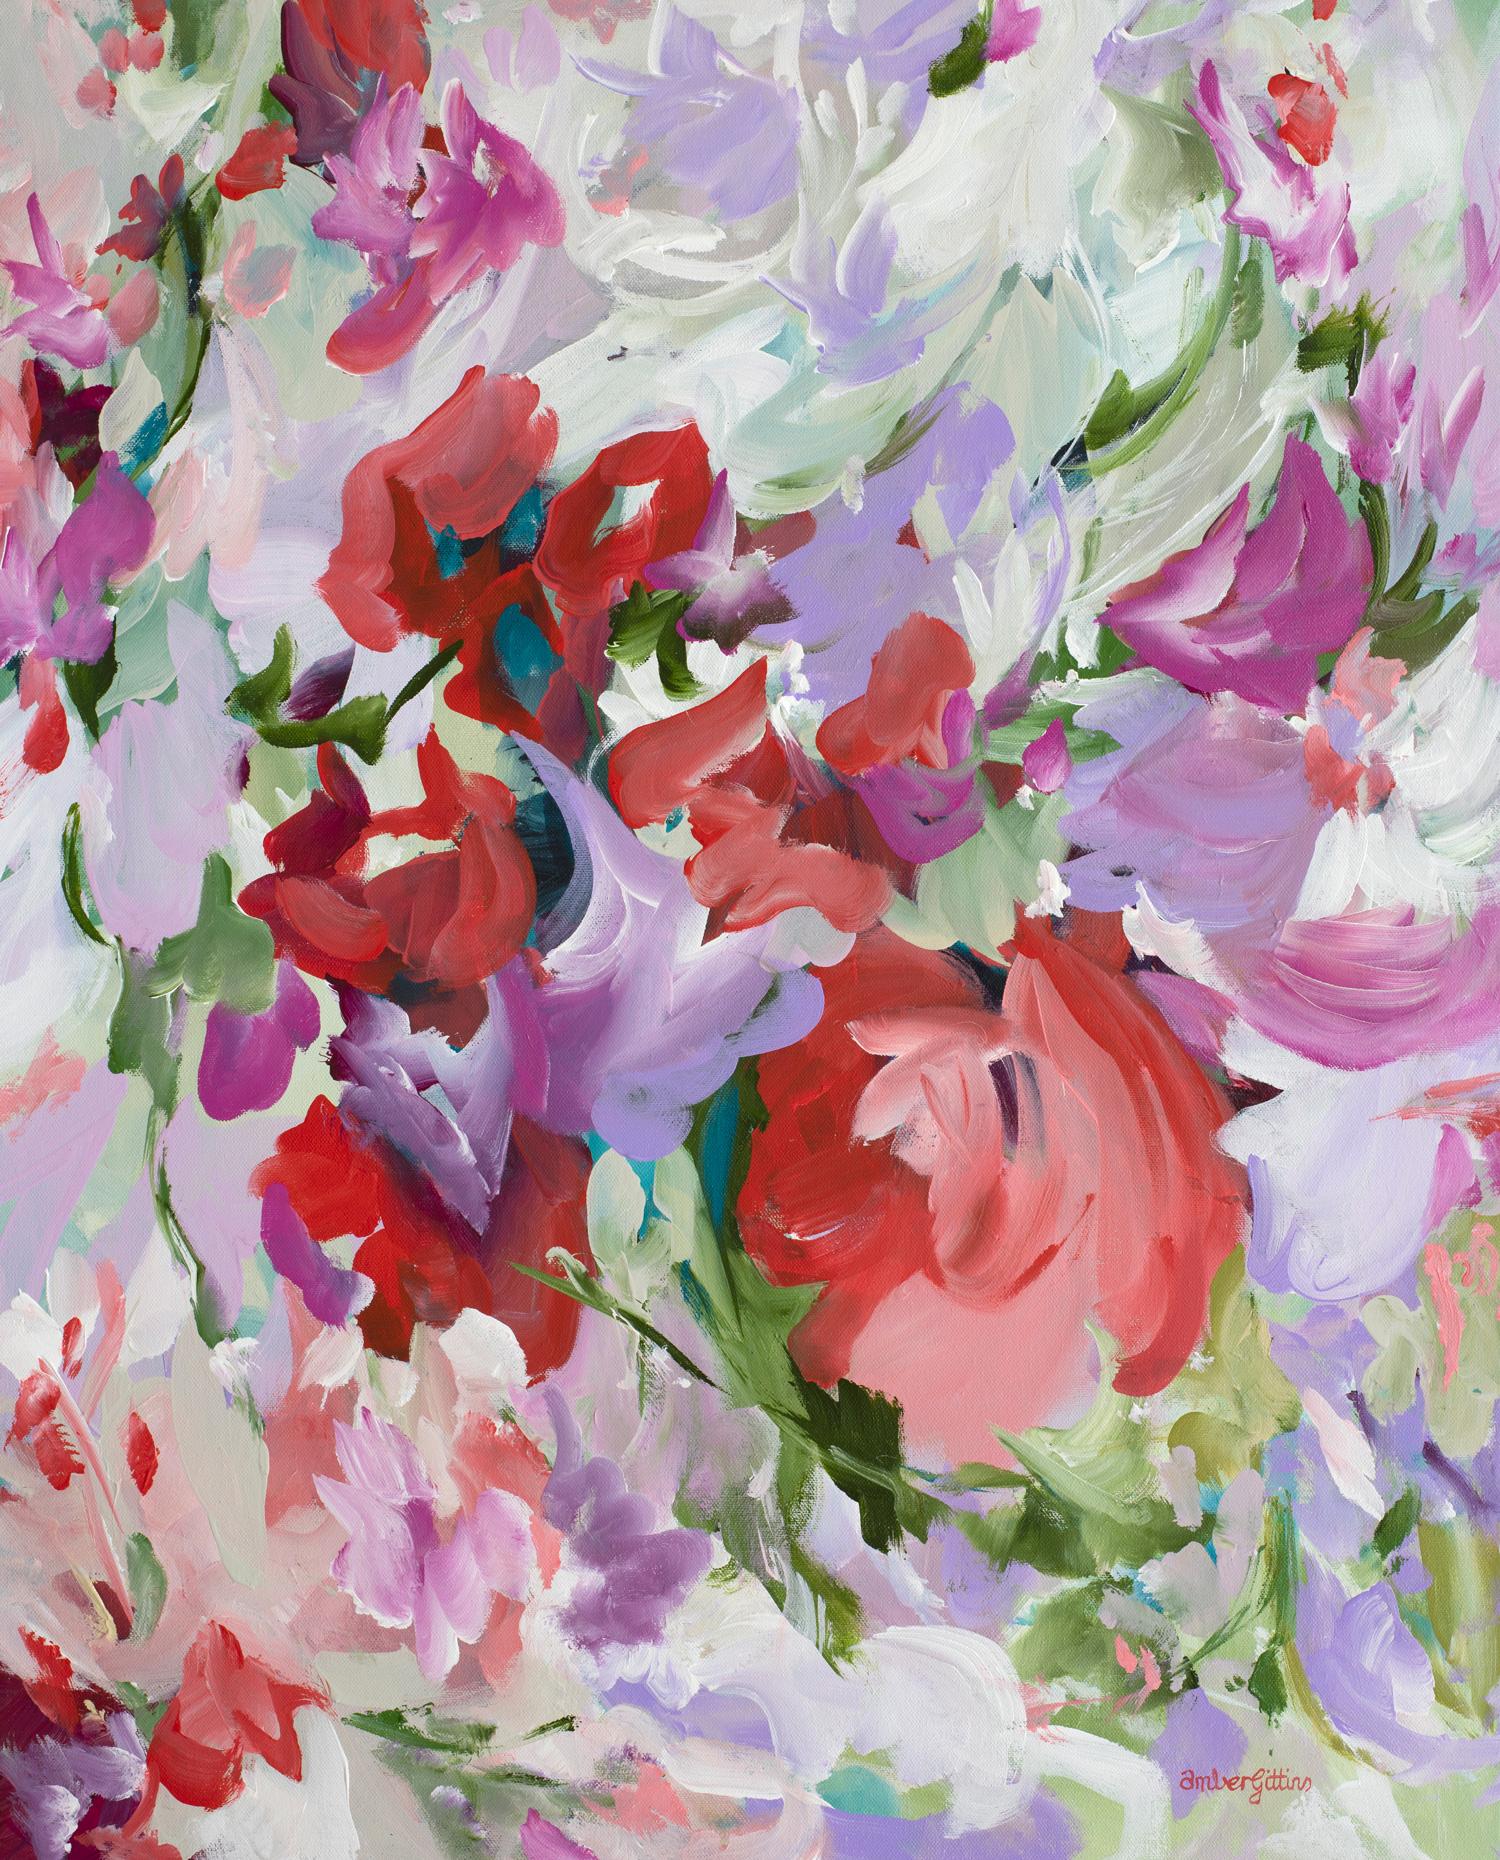 Pretty In Pink By Amber Gittins